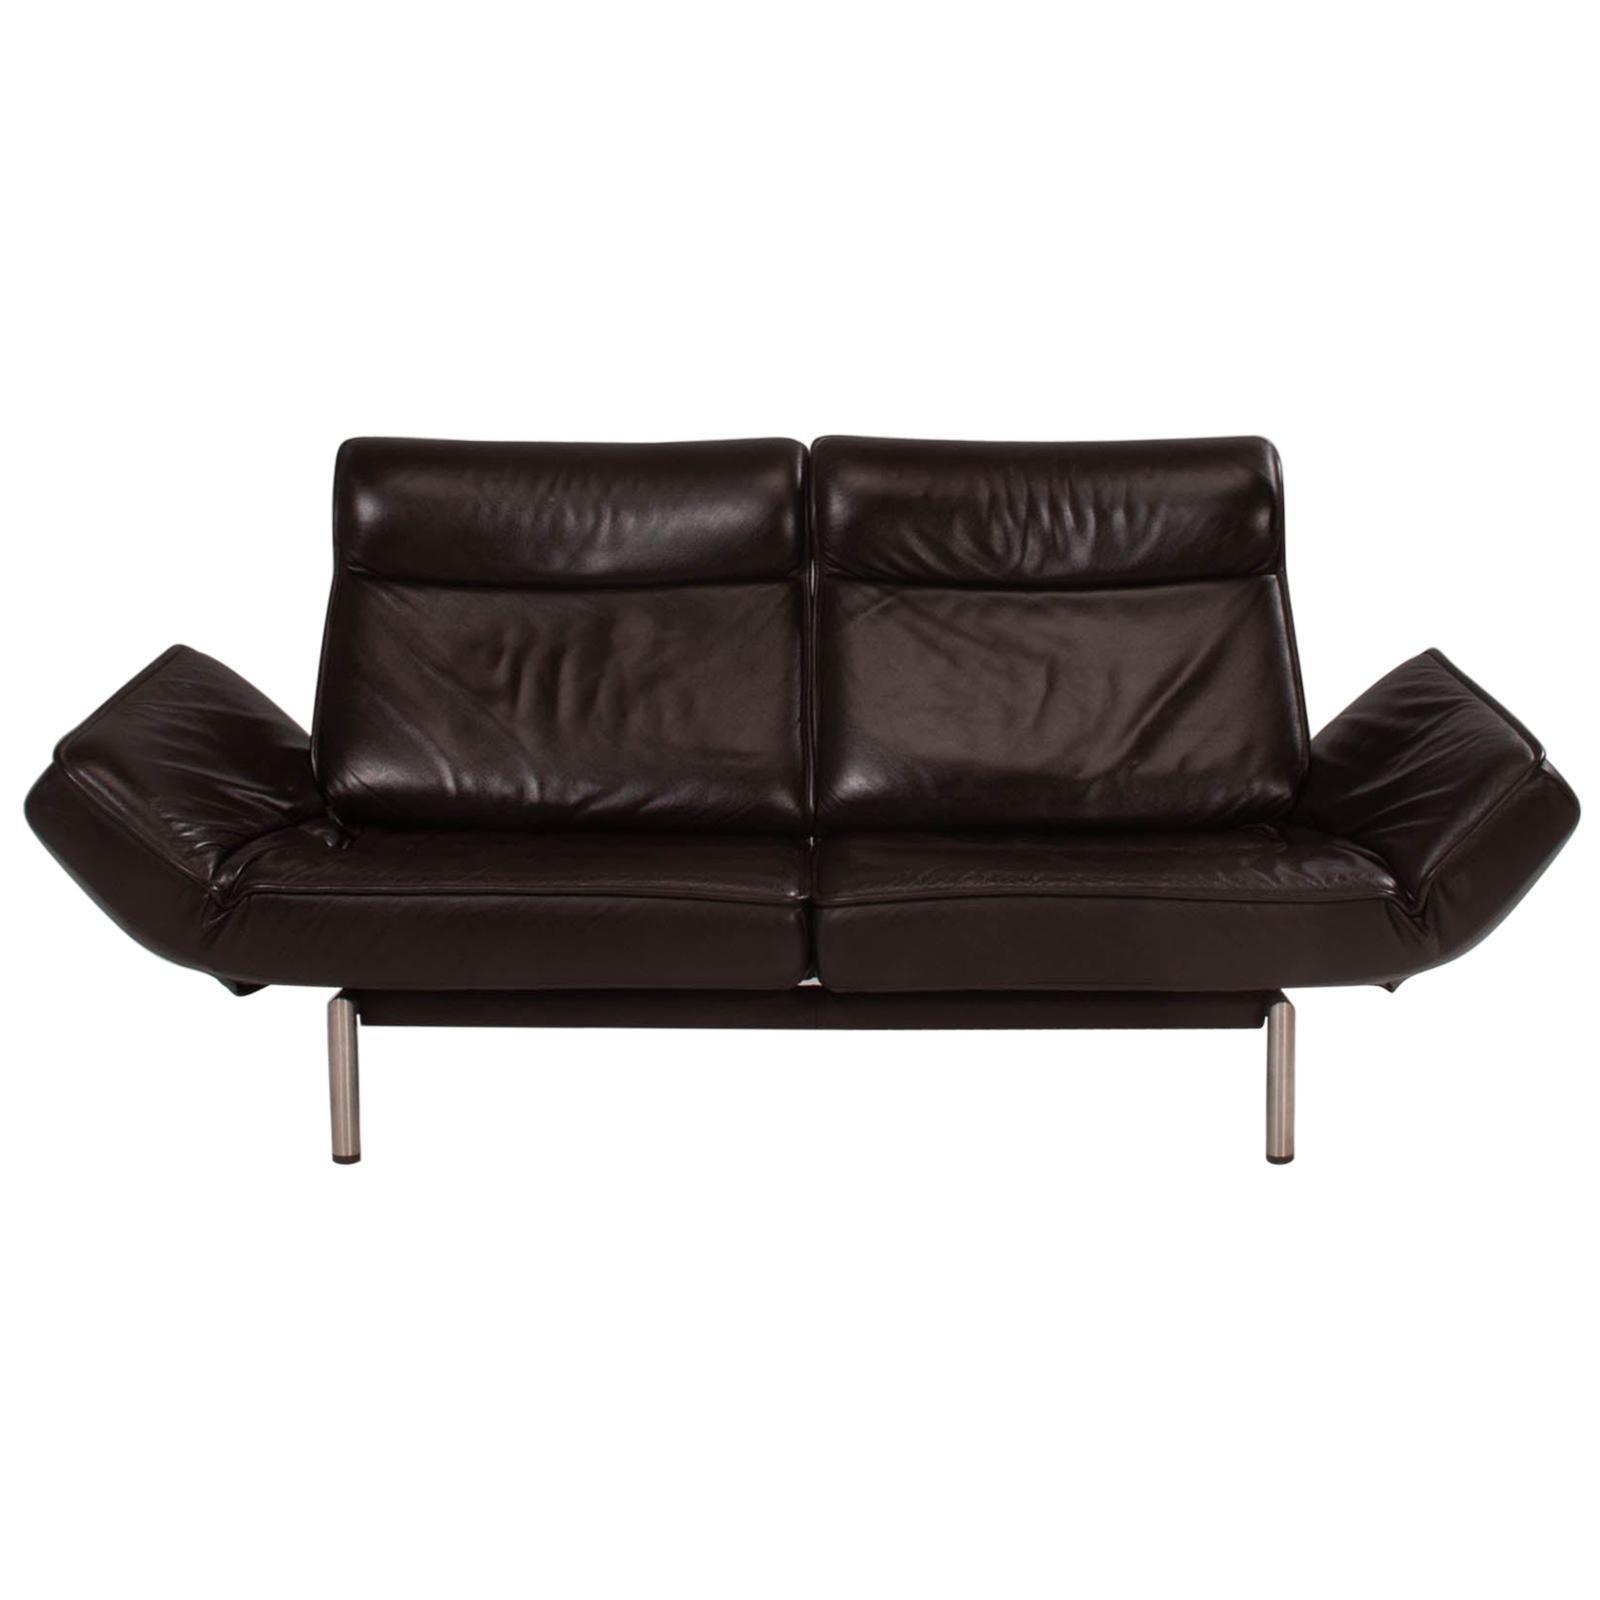 De Sede by Thomas Althaus DS-450 Brown Leather Sofa